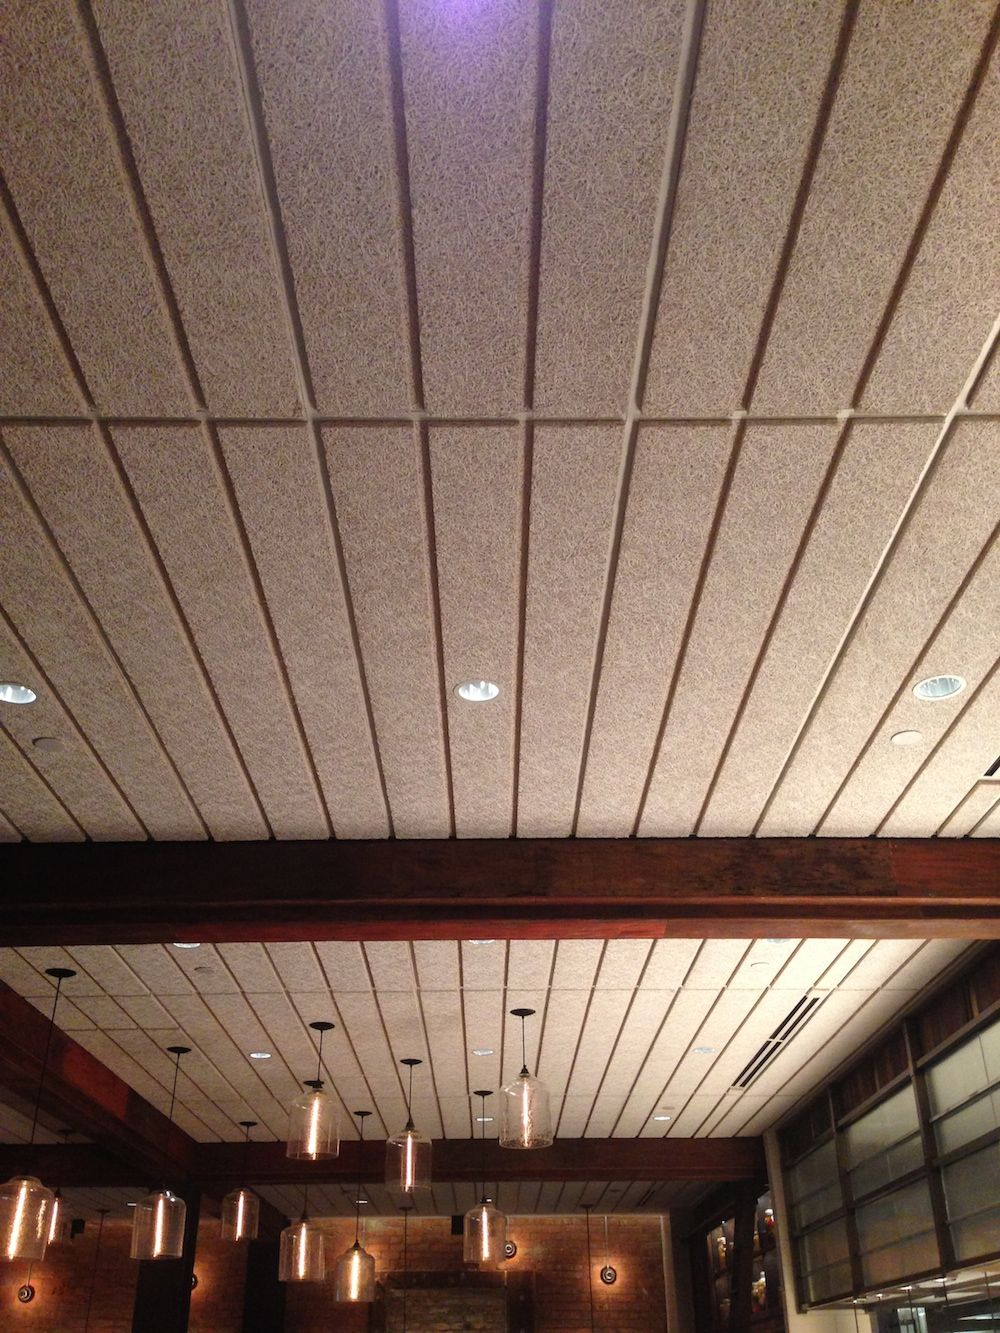 Tectum Acoustical Ceiling Panels in 2018 | Nautical ...